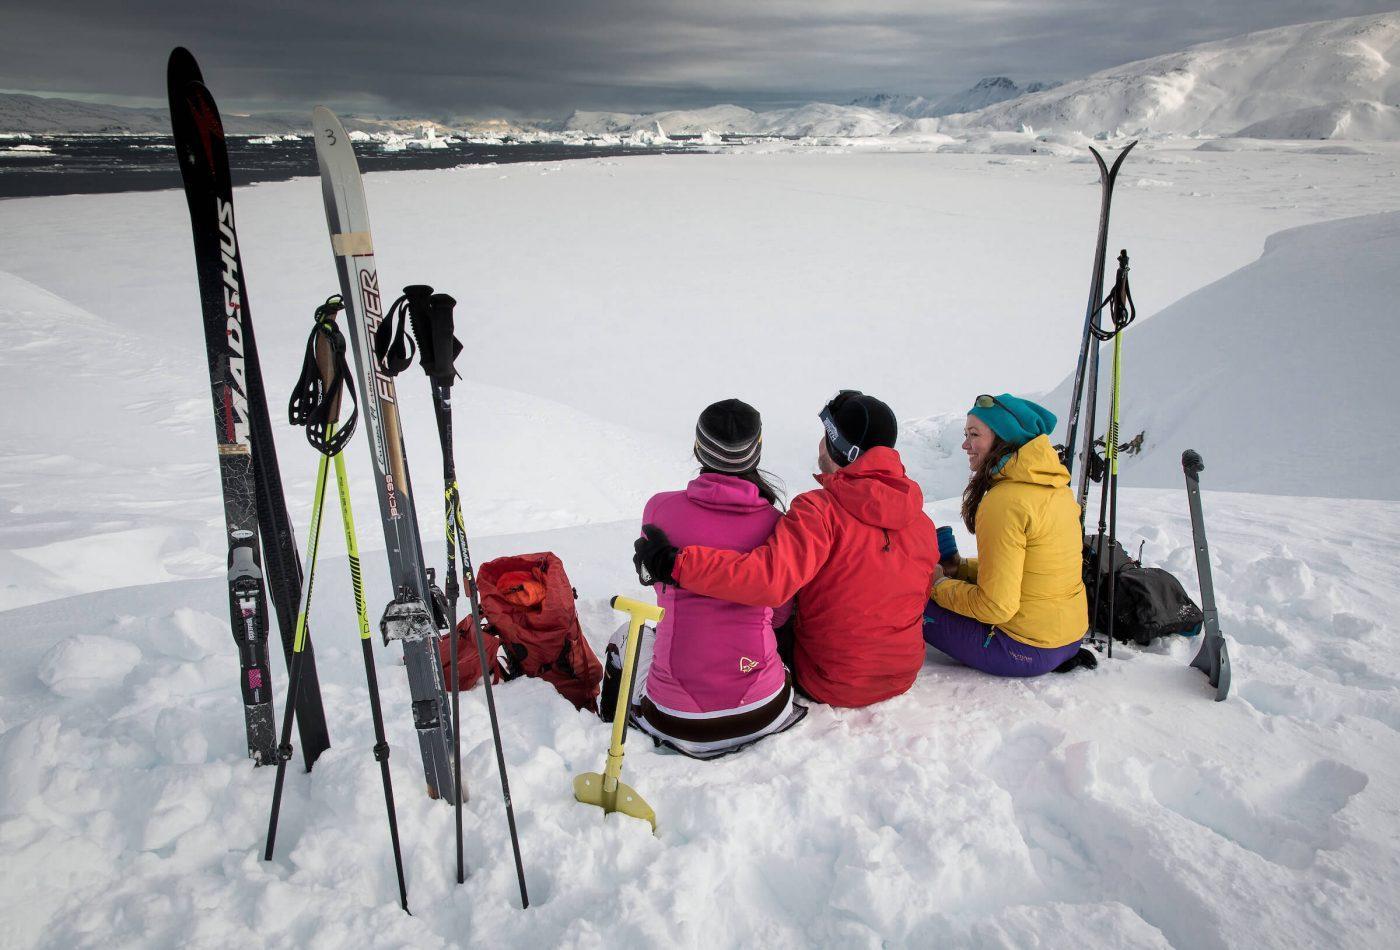 Backcountry skiers on a coffee break above Sermilik ice fjord in East Greenland